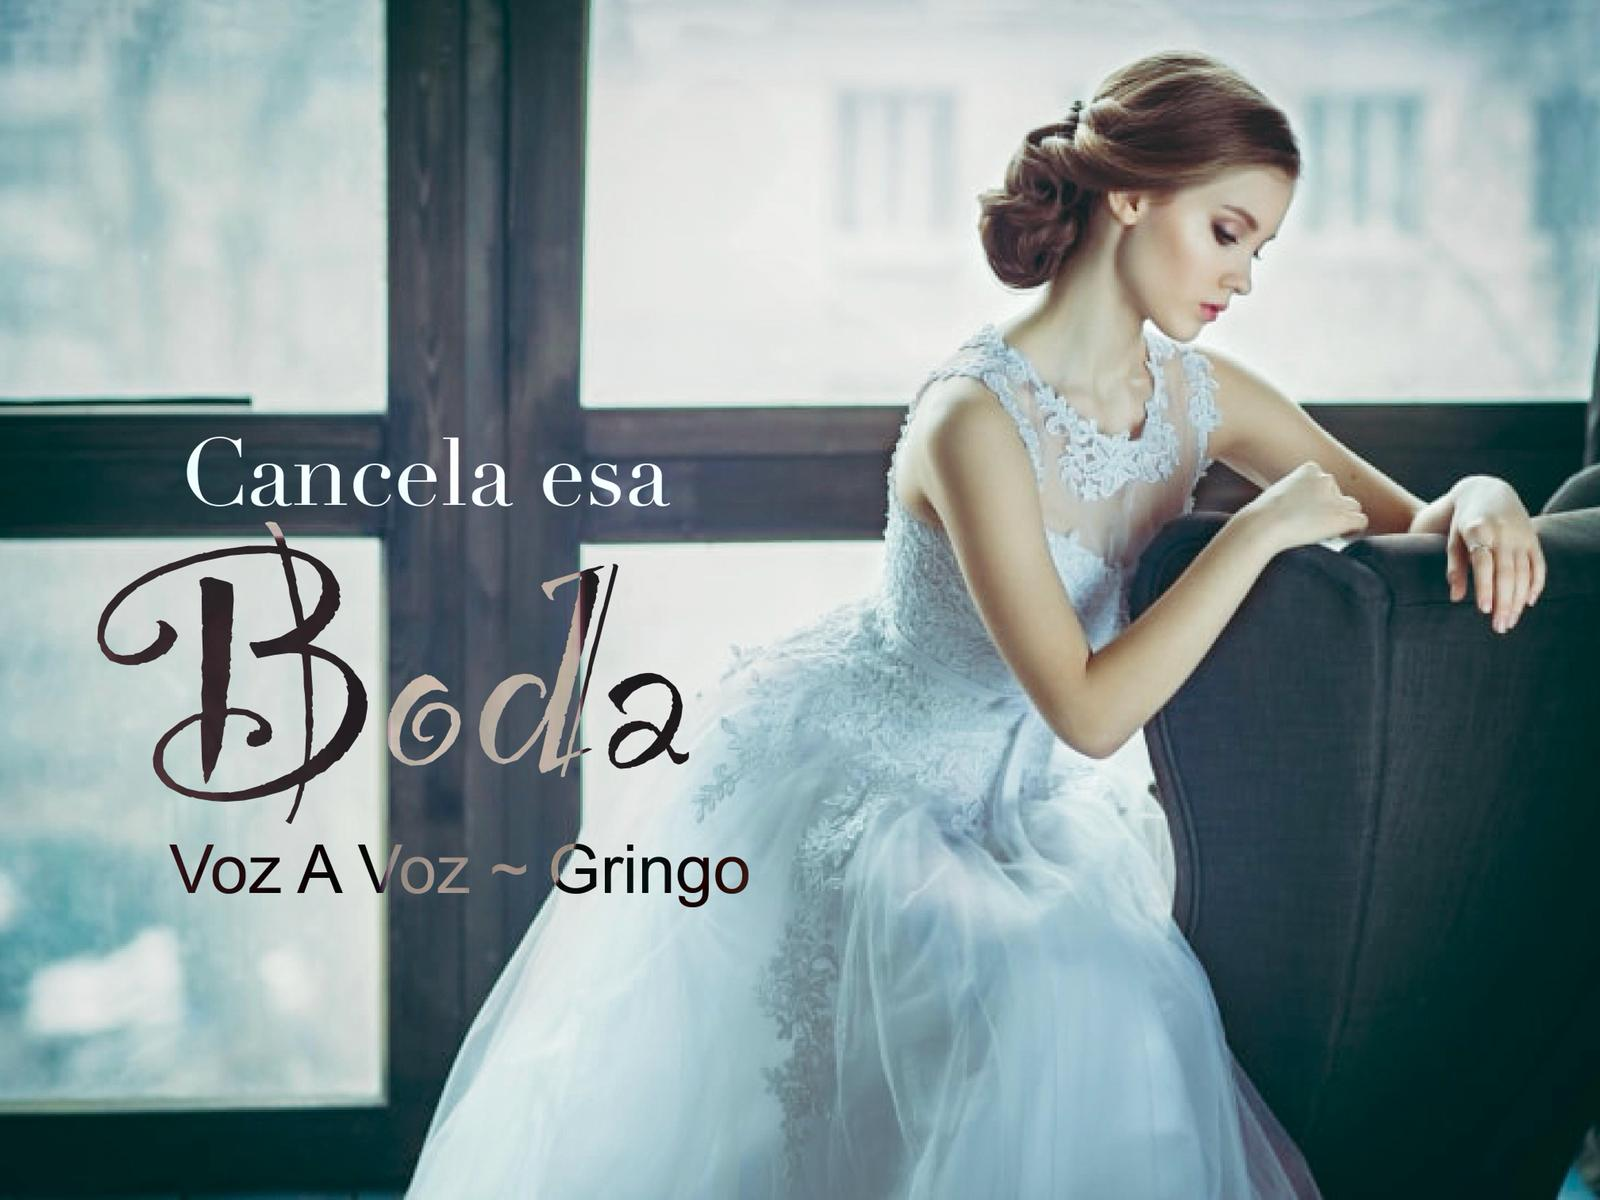 Cancela Esa Boda, El Gringo feat. Gio Voz a Voz